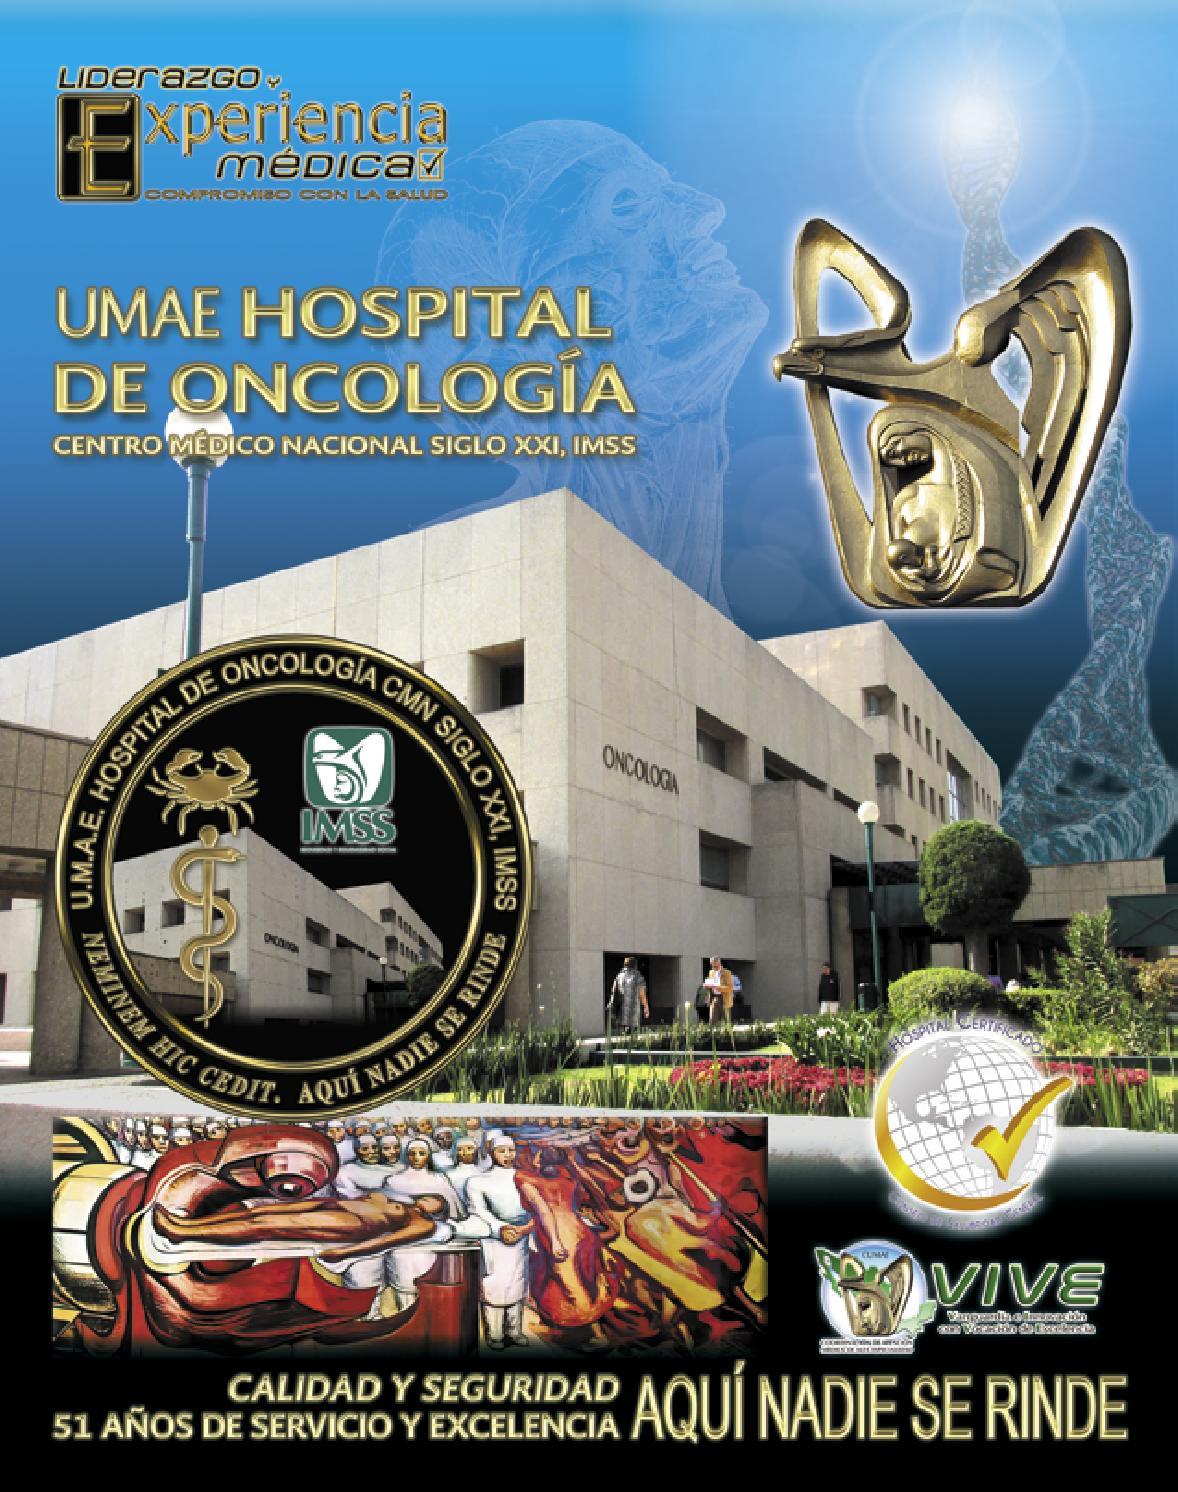 centro de excelencia para la embolización de próstata central italiana